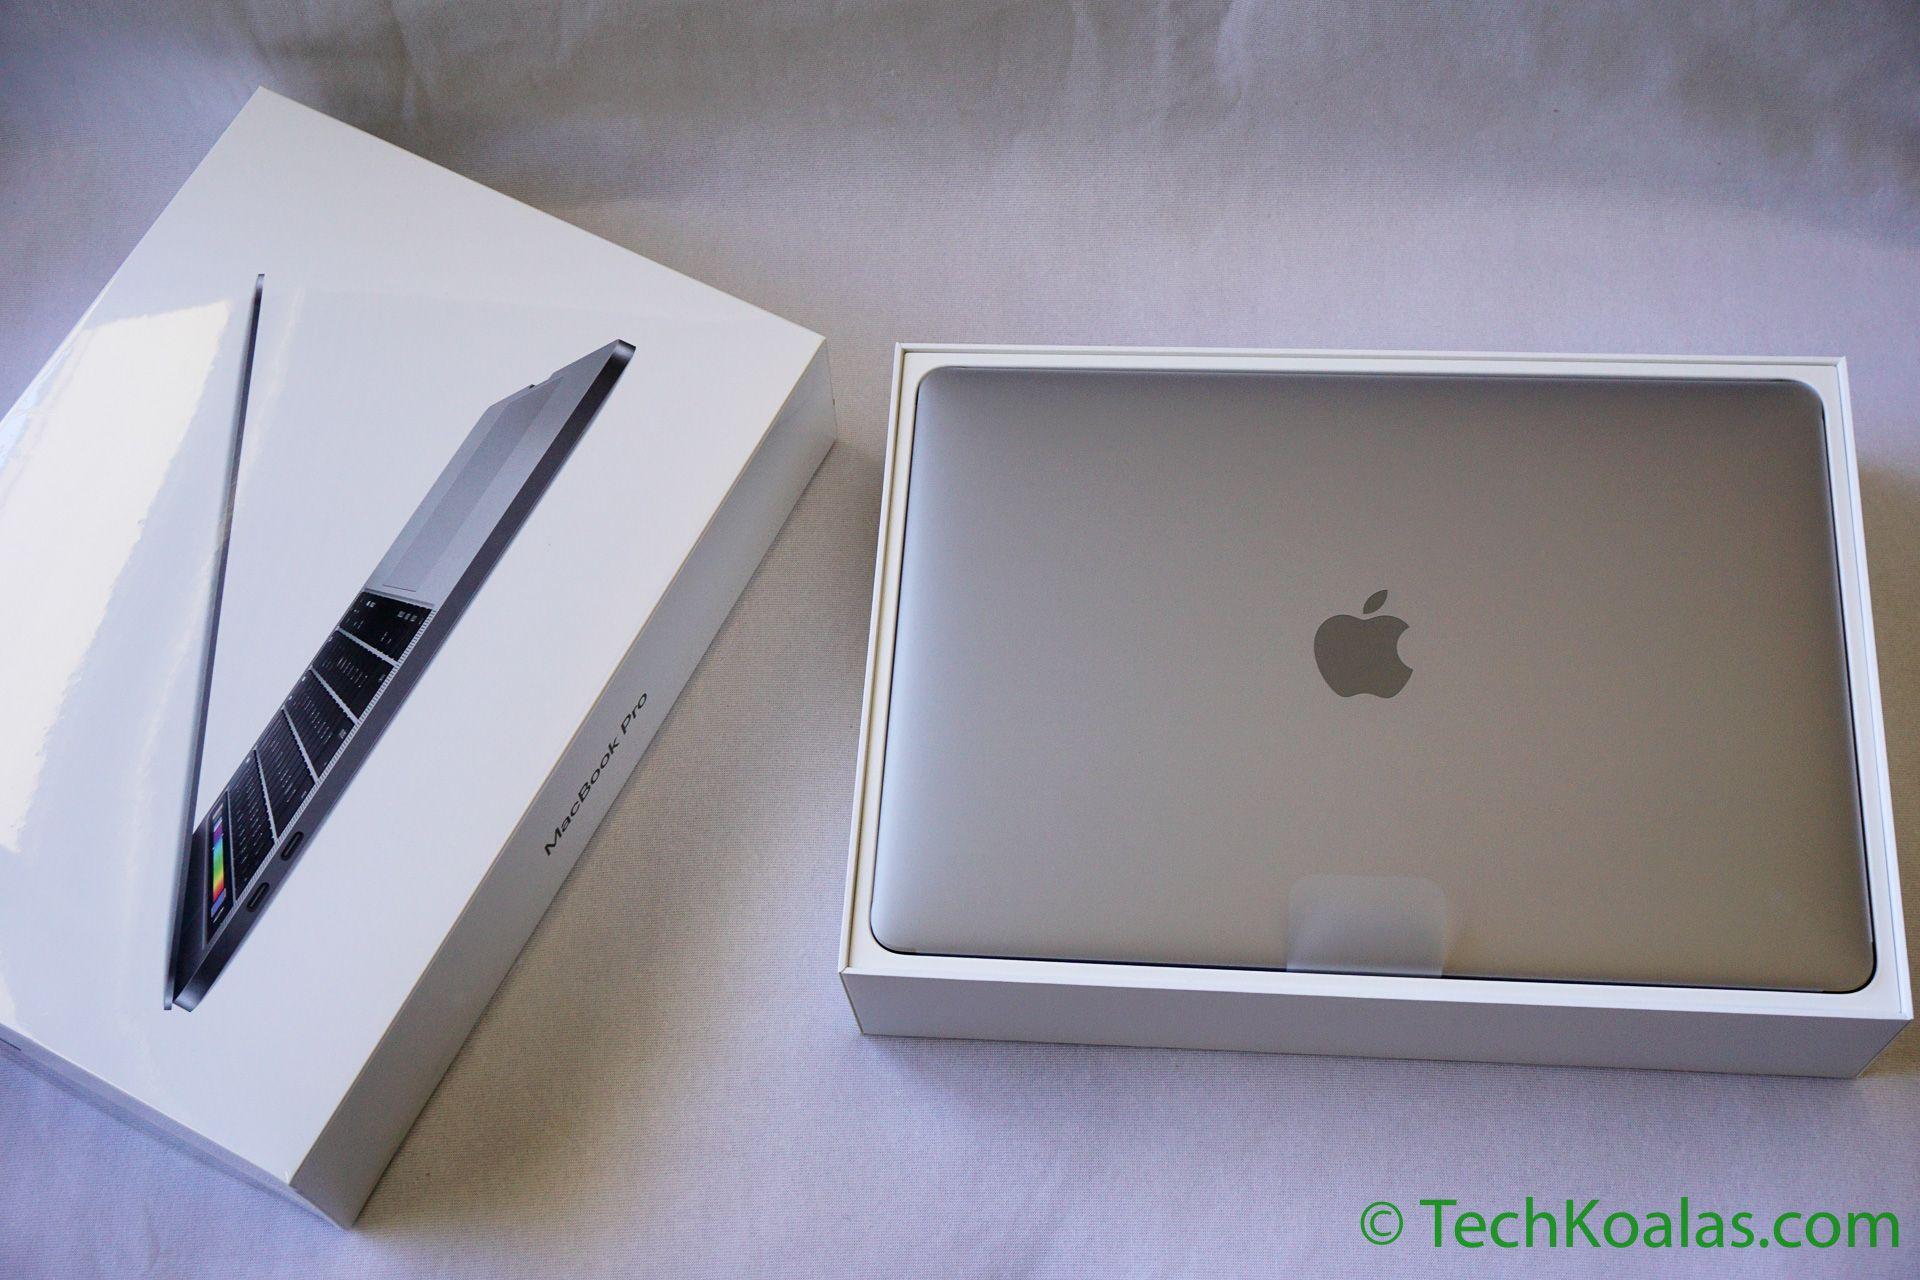 wholesale macbook air 11 inch wholesale,which macbook